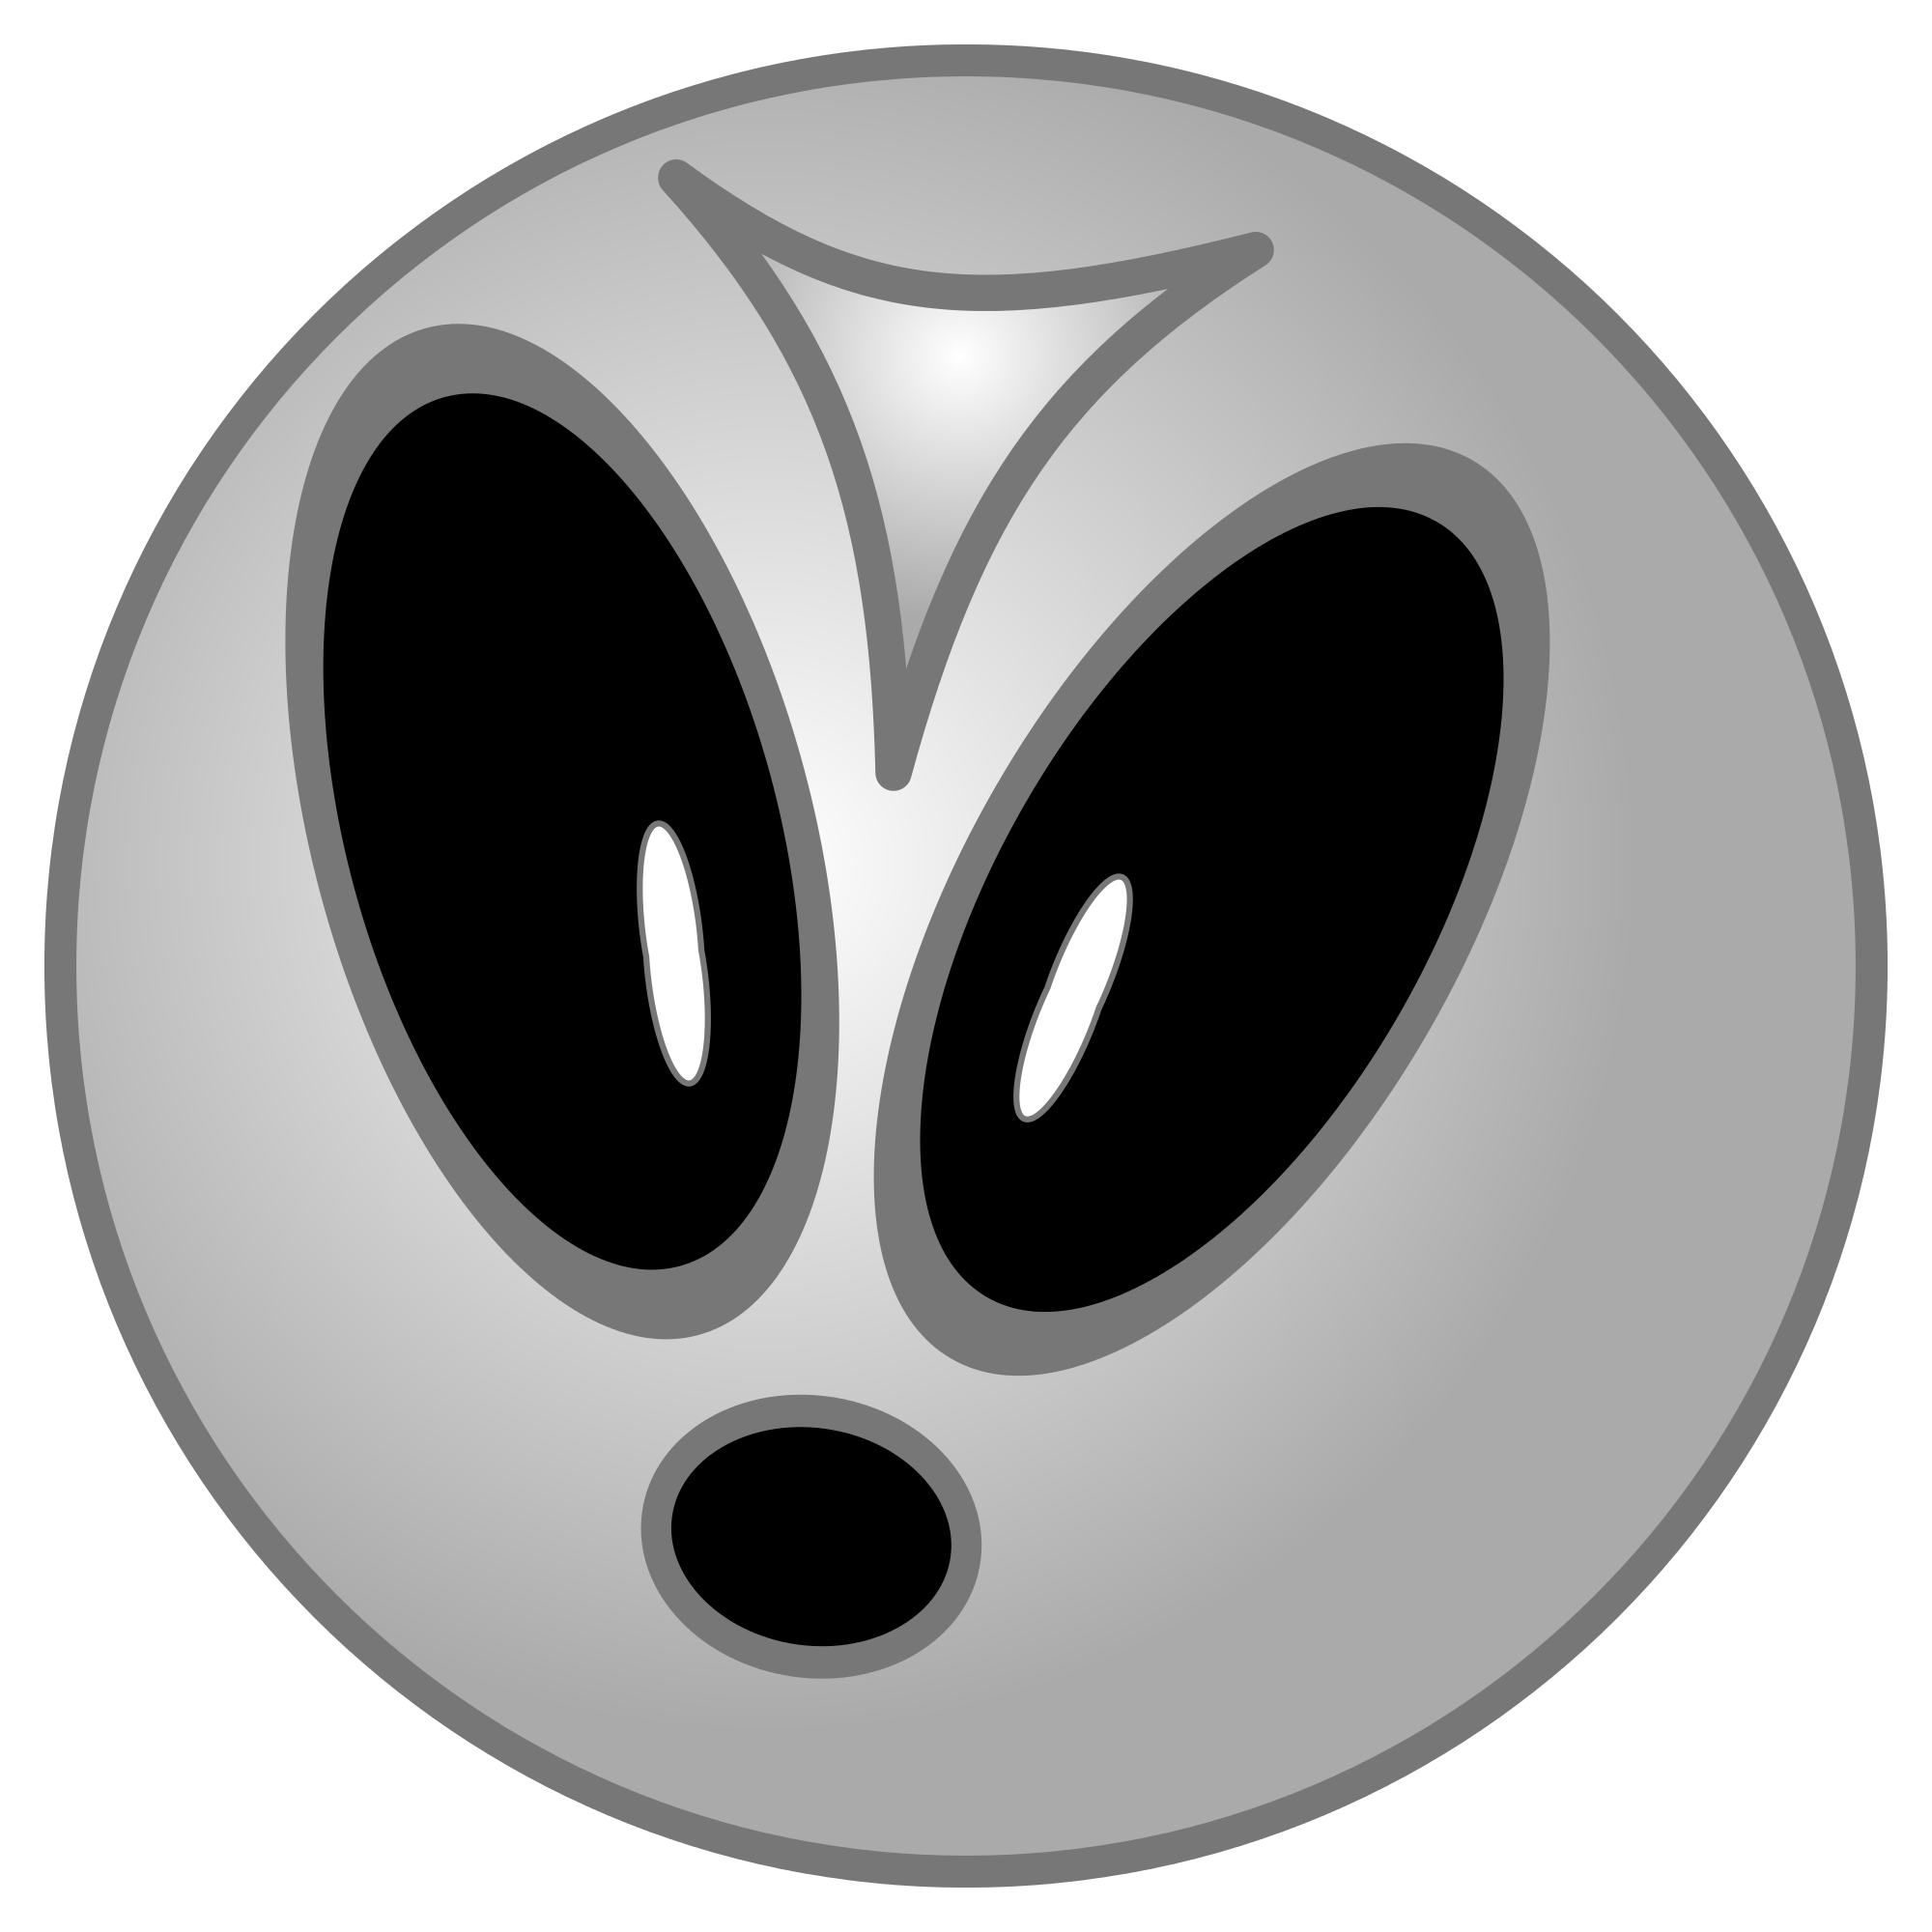 Alien svg #8, Download drawings